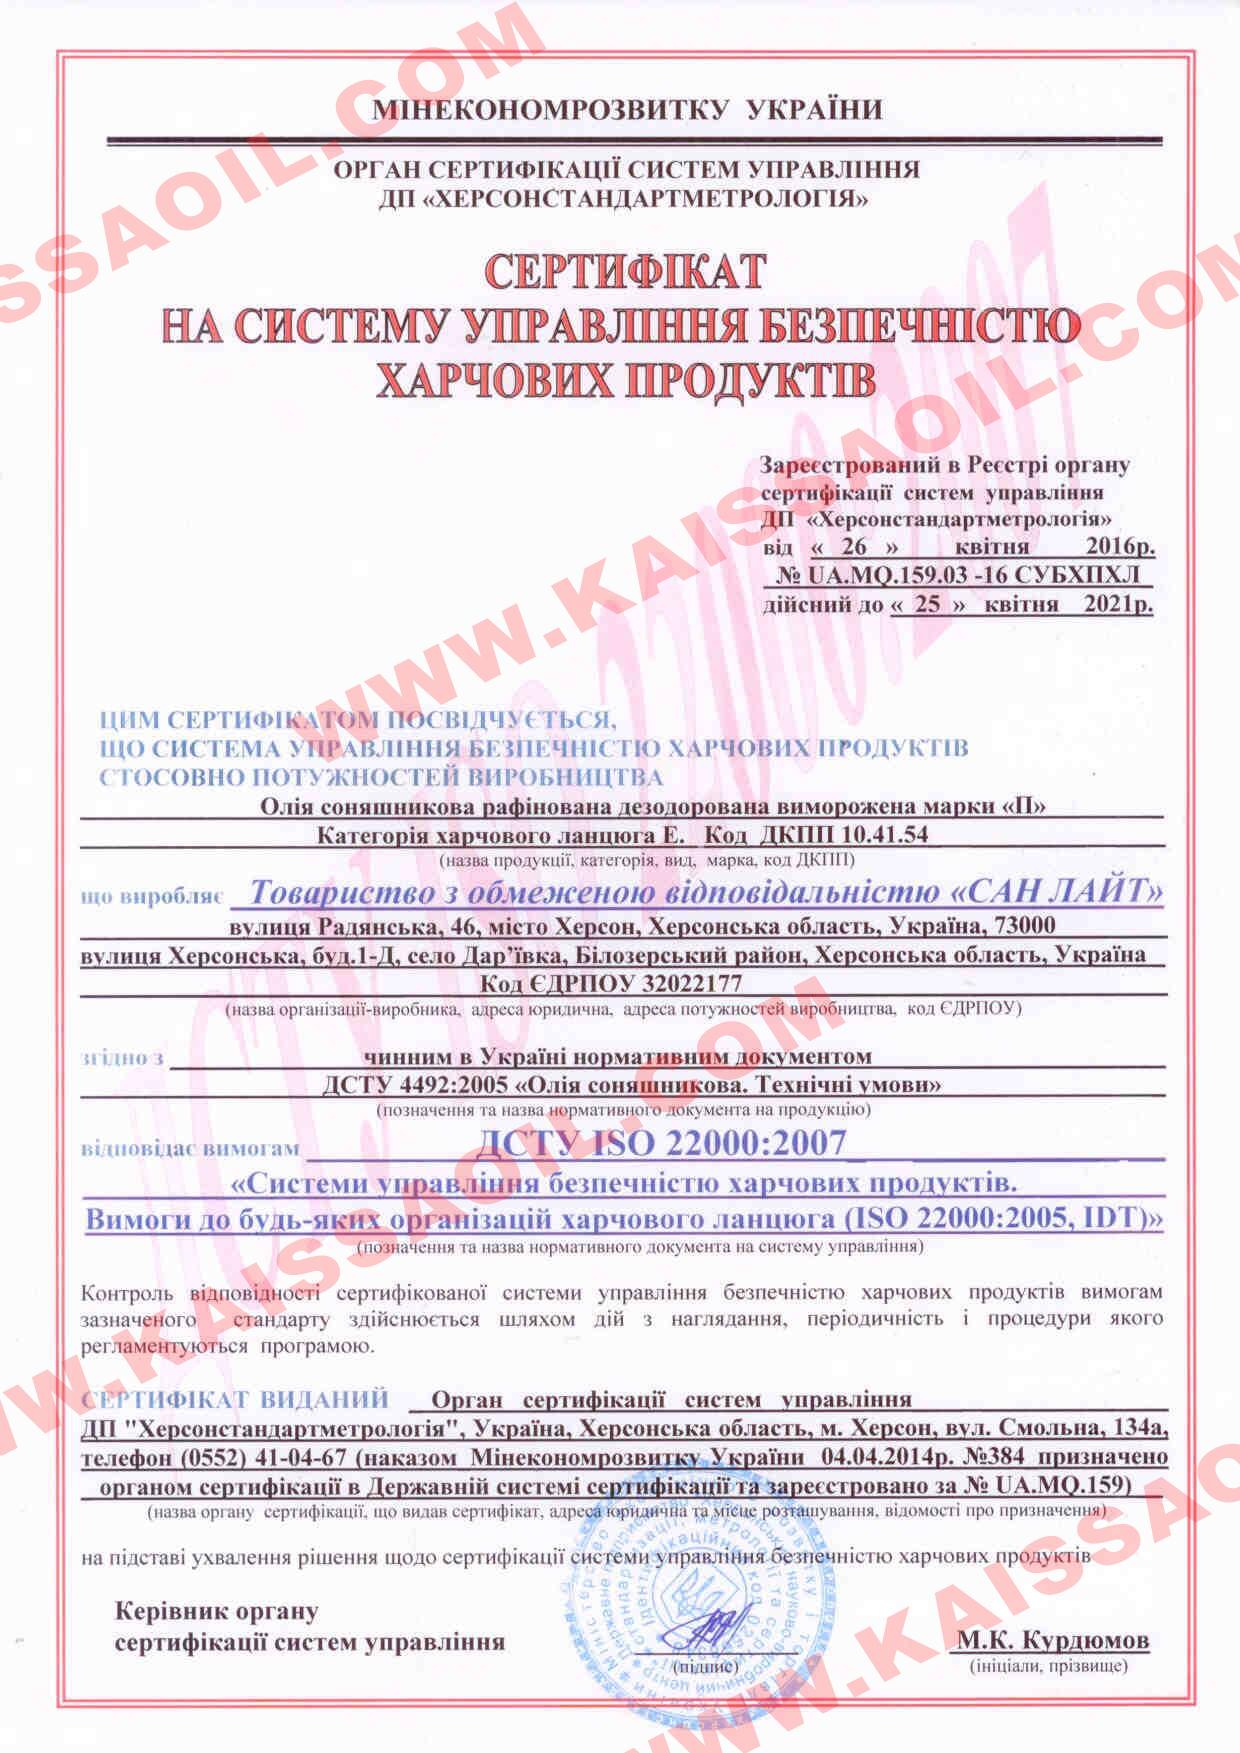 Certificate ISO DSTU 22000:2007